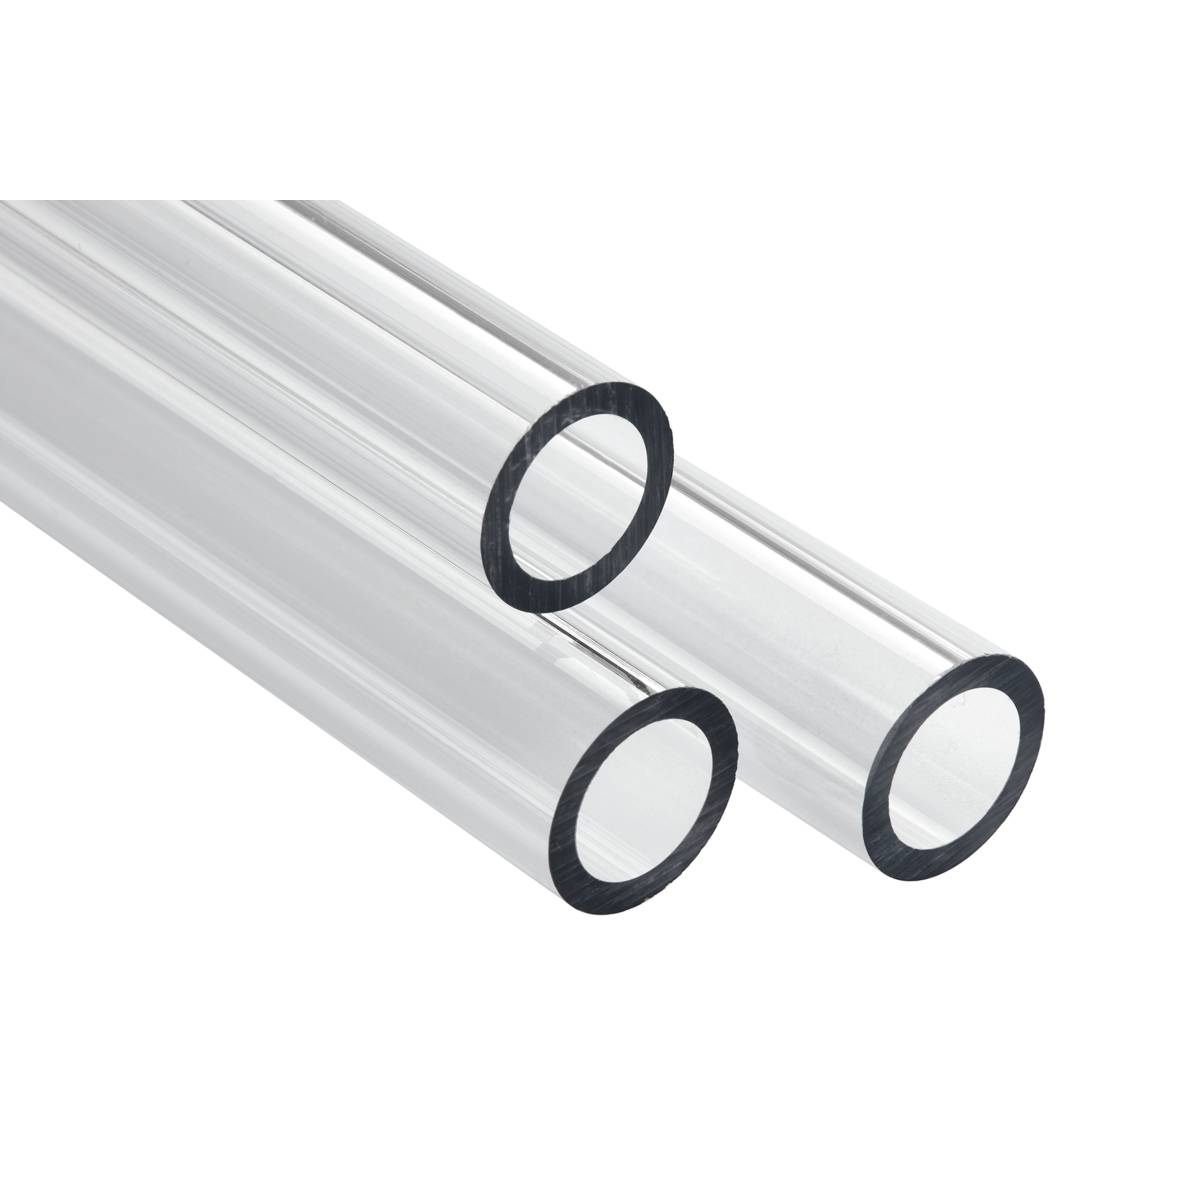 CORSAIR Hydro X Series XT Hardline 14mm Tubing